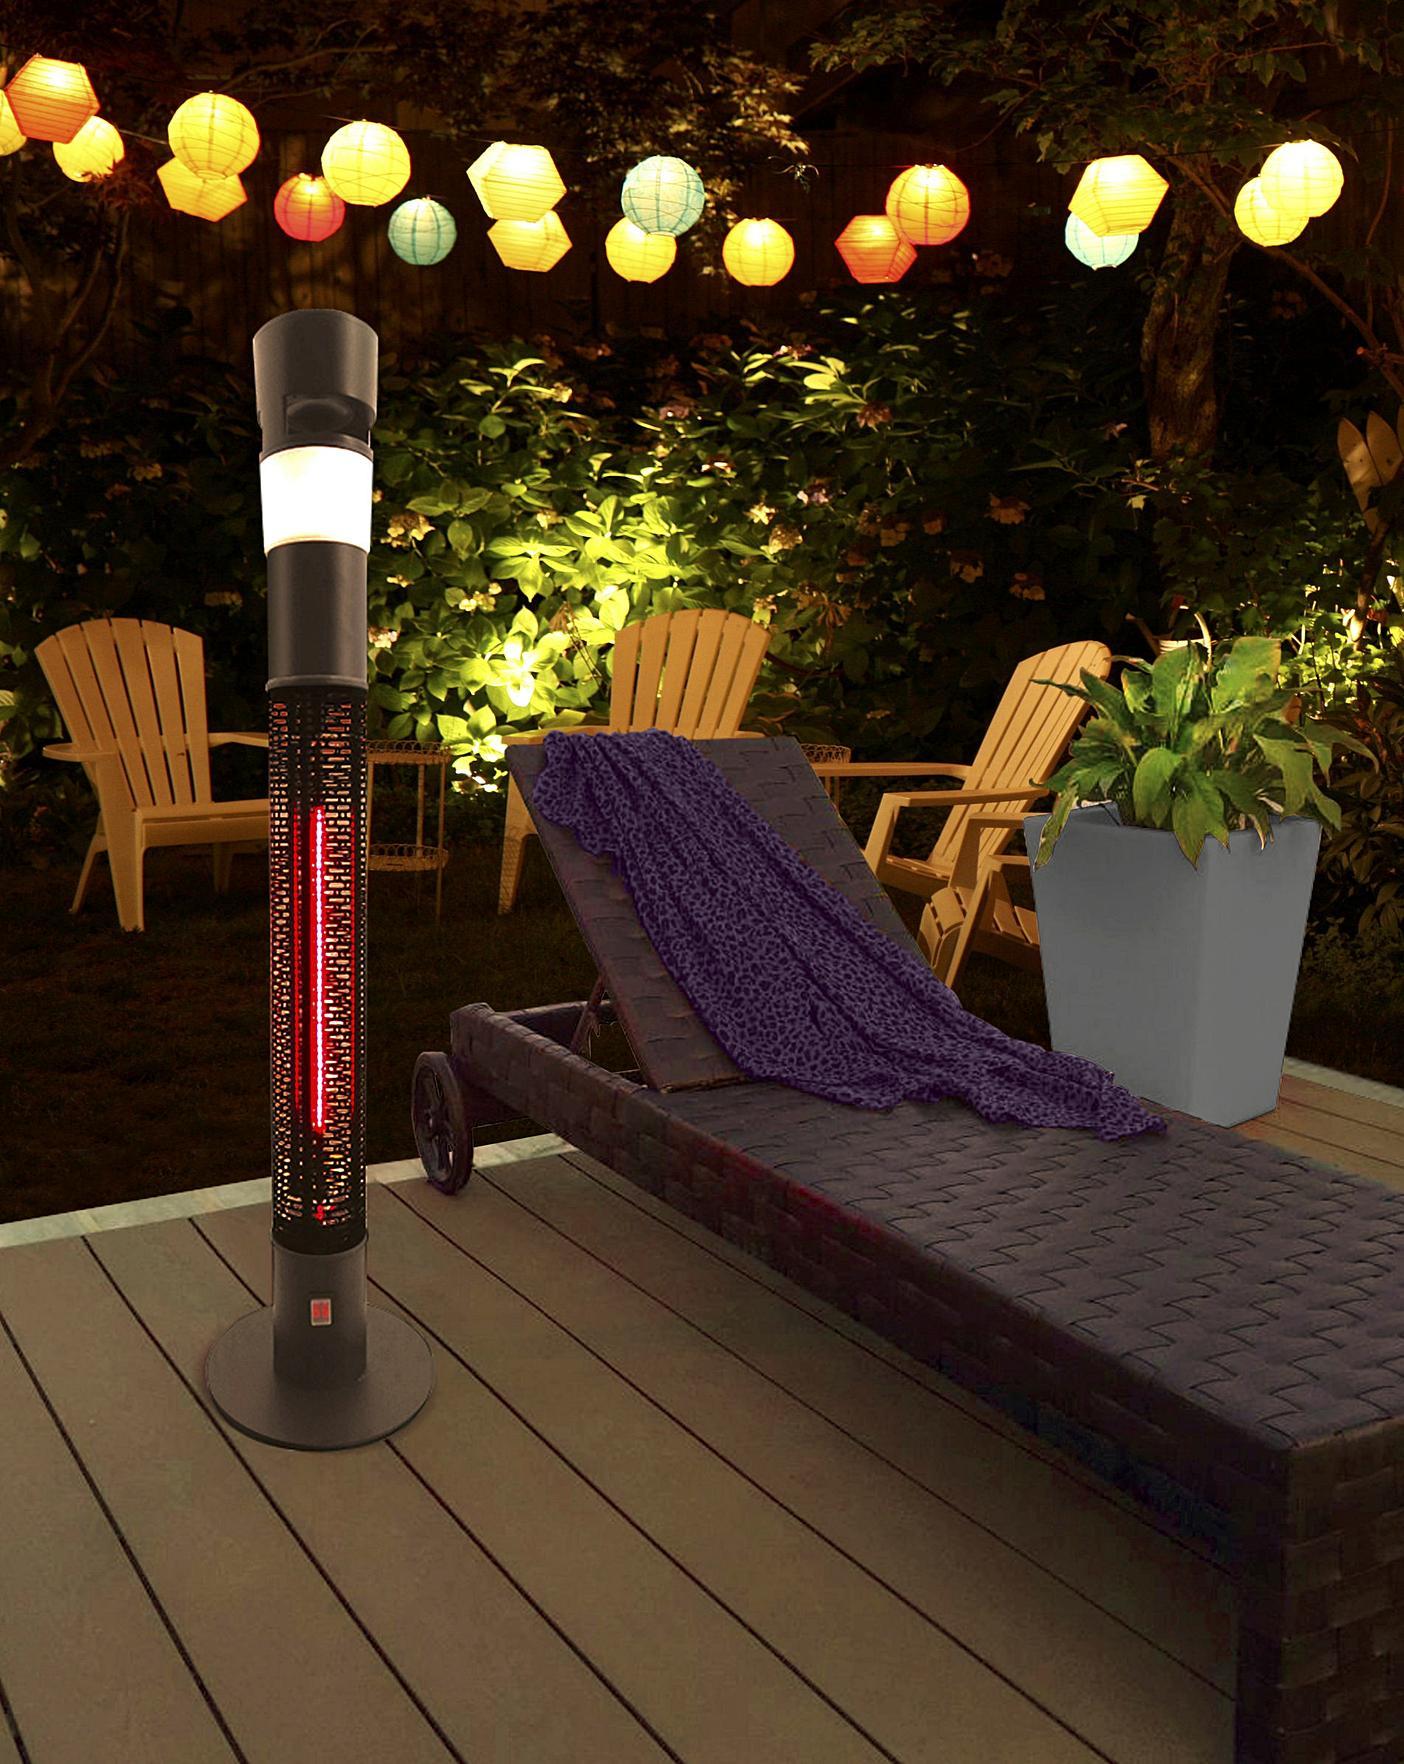 Dimplex Patio Heater With Speaker